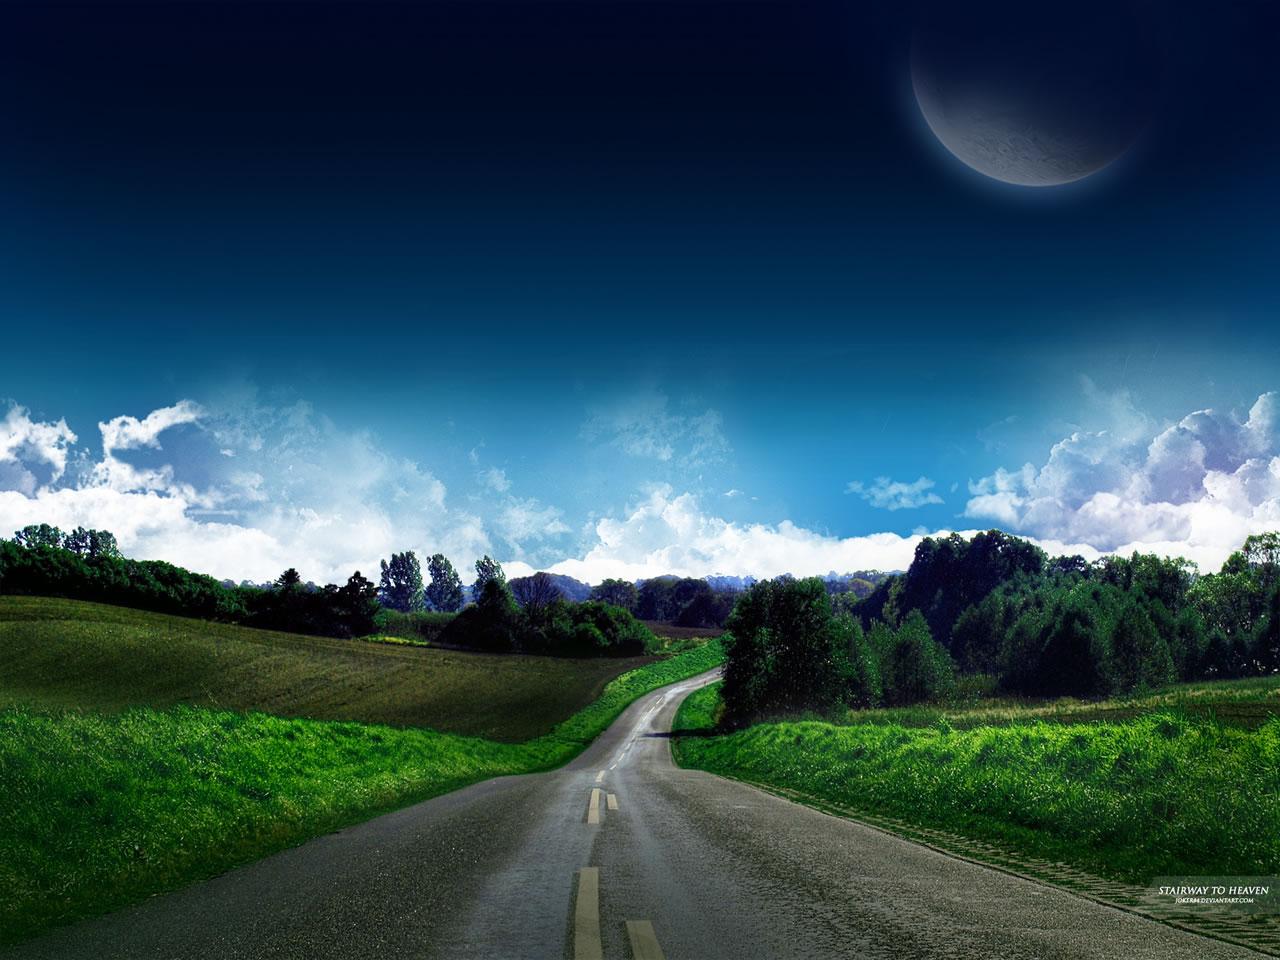 Zimmer Imagines Heaven Spads Literary Potpourri 1280x960